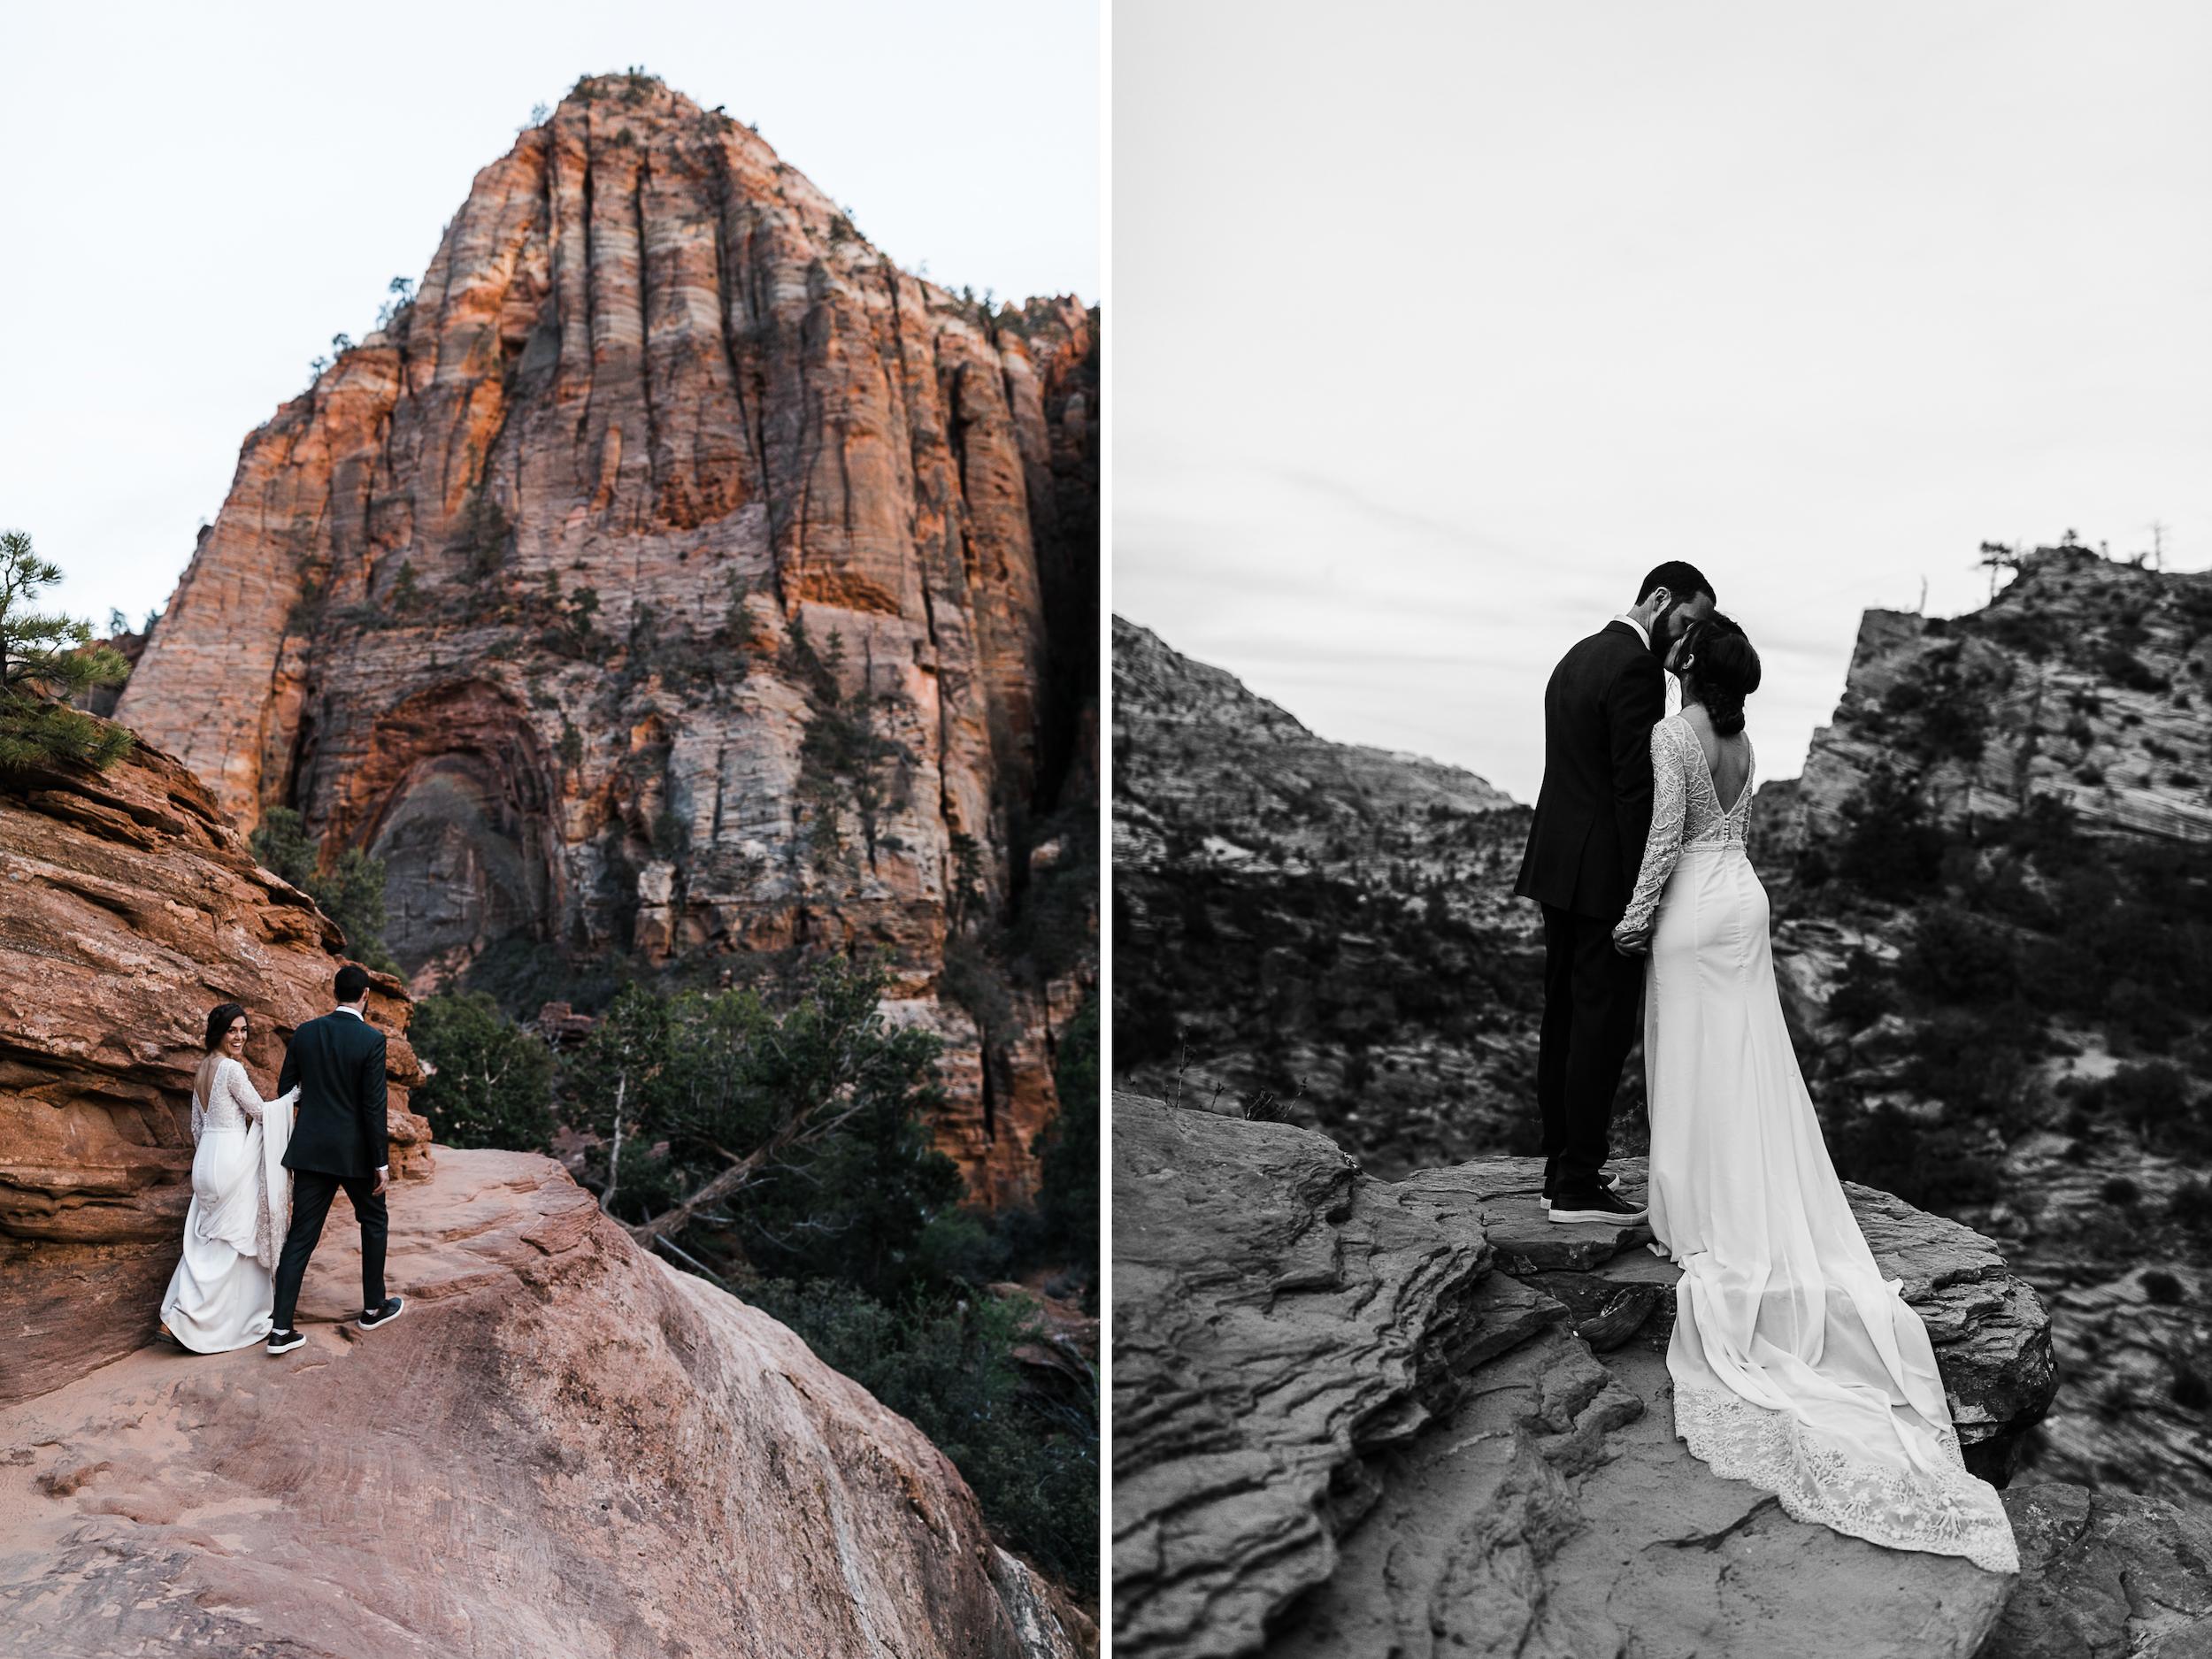 Zion-National-Park-Adventure-Wedding-Hearnes-Elopement-Photography-58.jpg